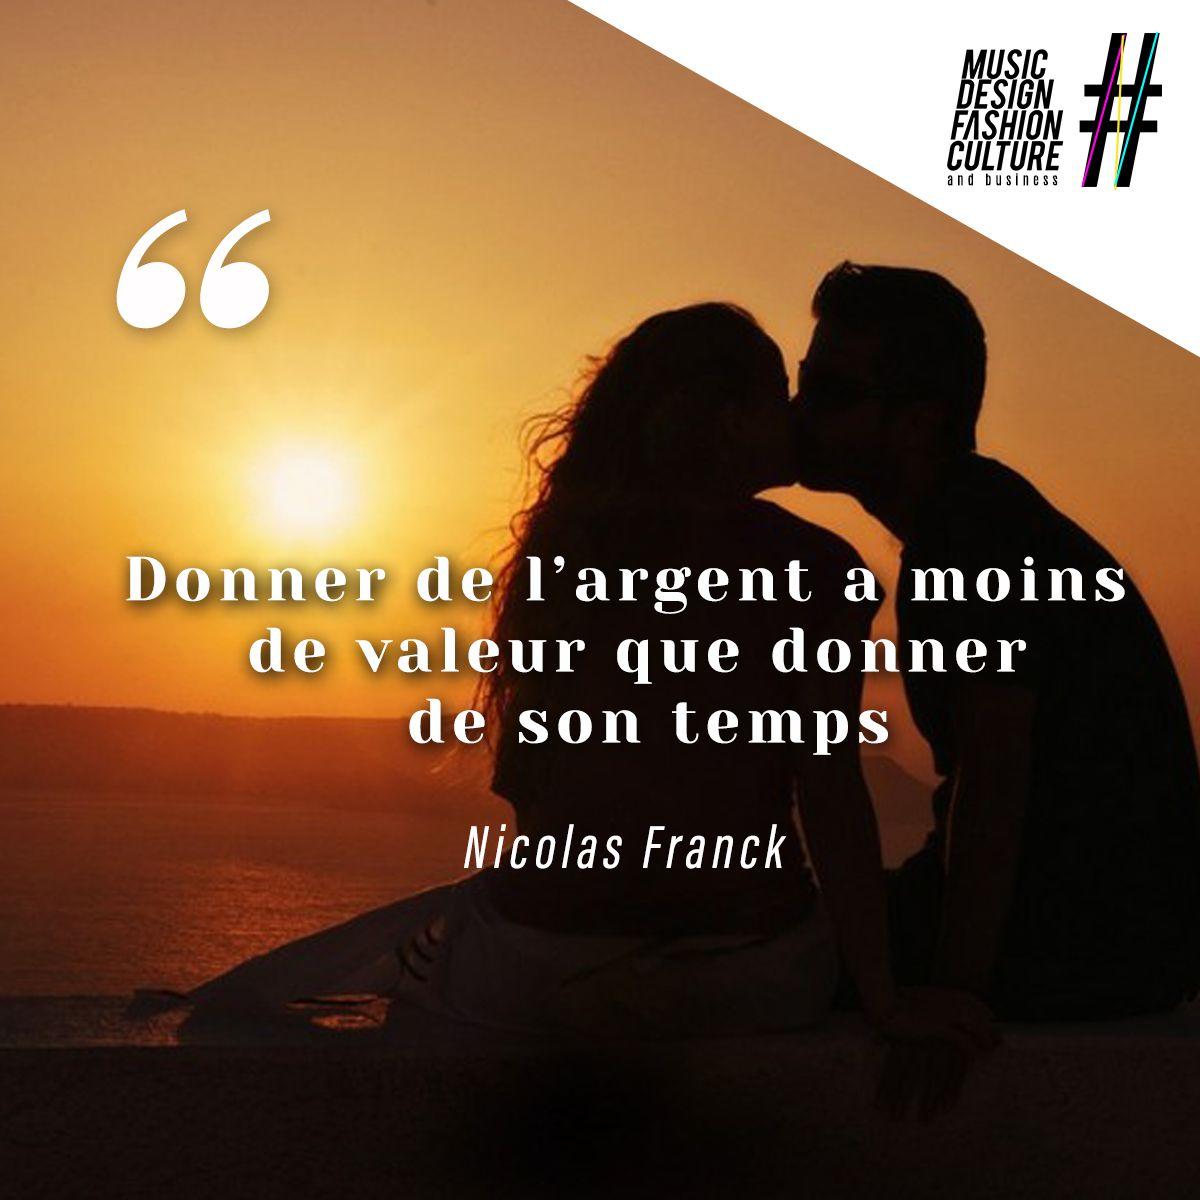 Citation positive de Franck Nicolas